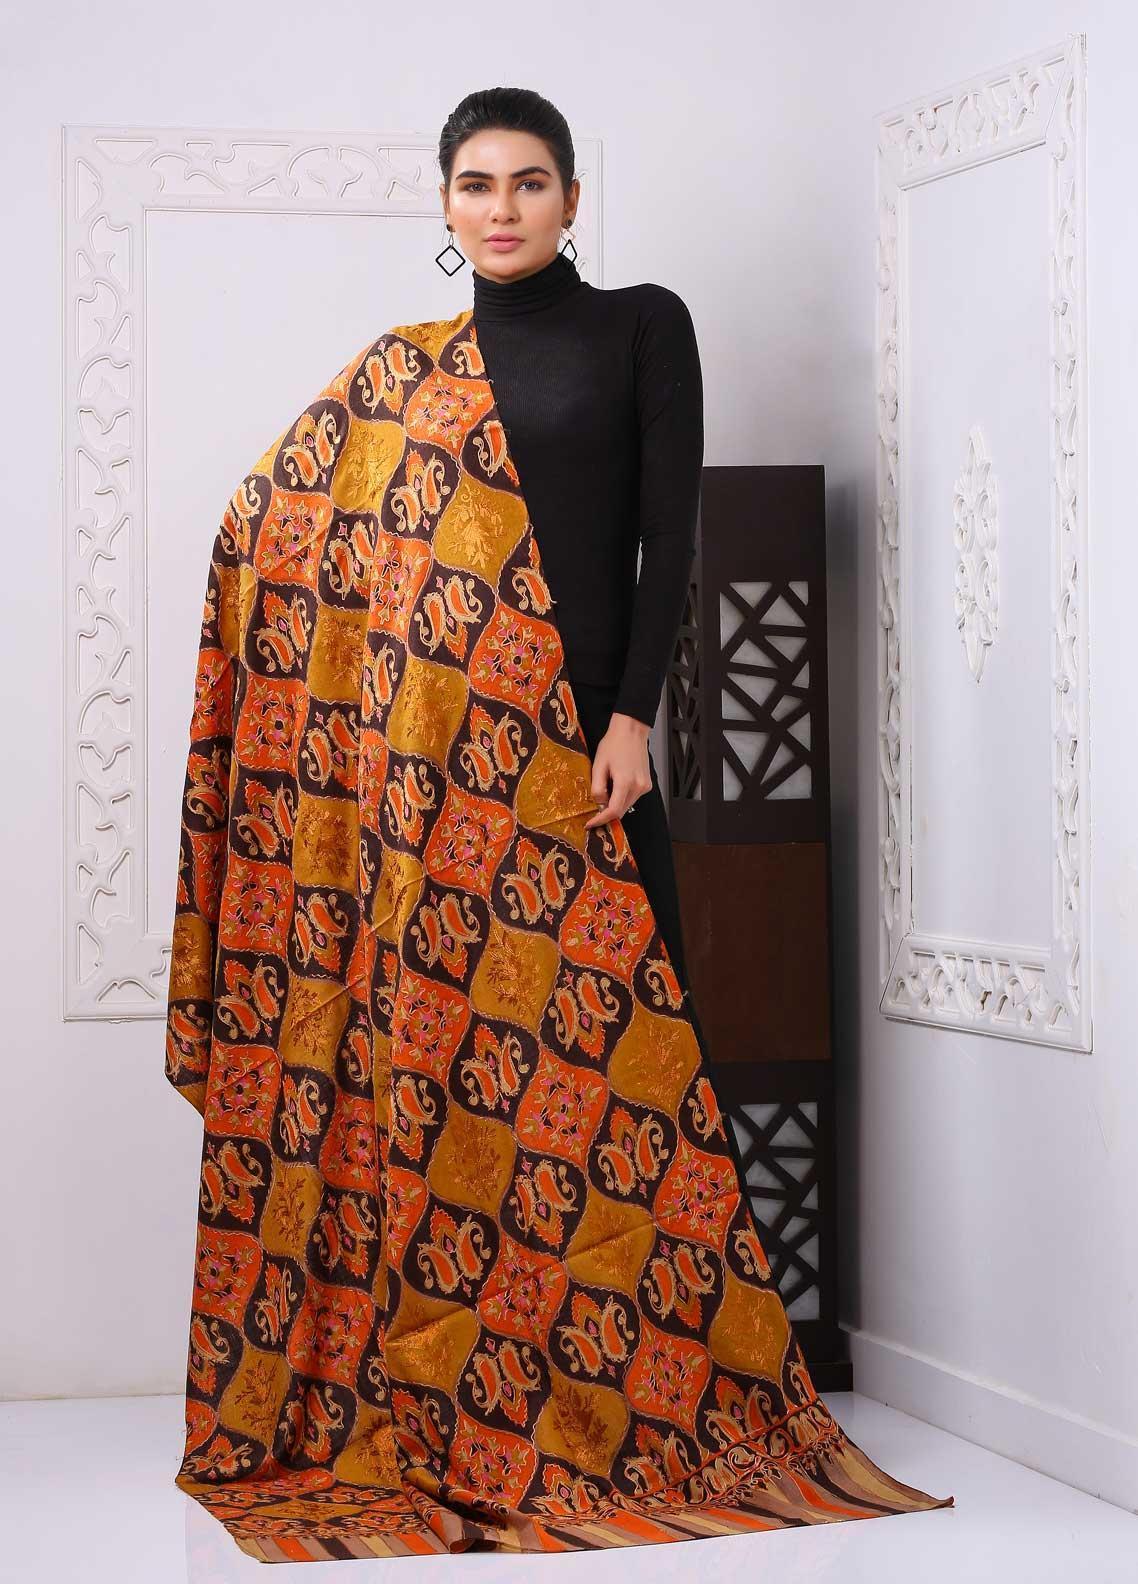 Sanaulla Exclusive Range Embroidered Pashmina  Shawl PMSH 323961 - Pashmina Shawls